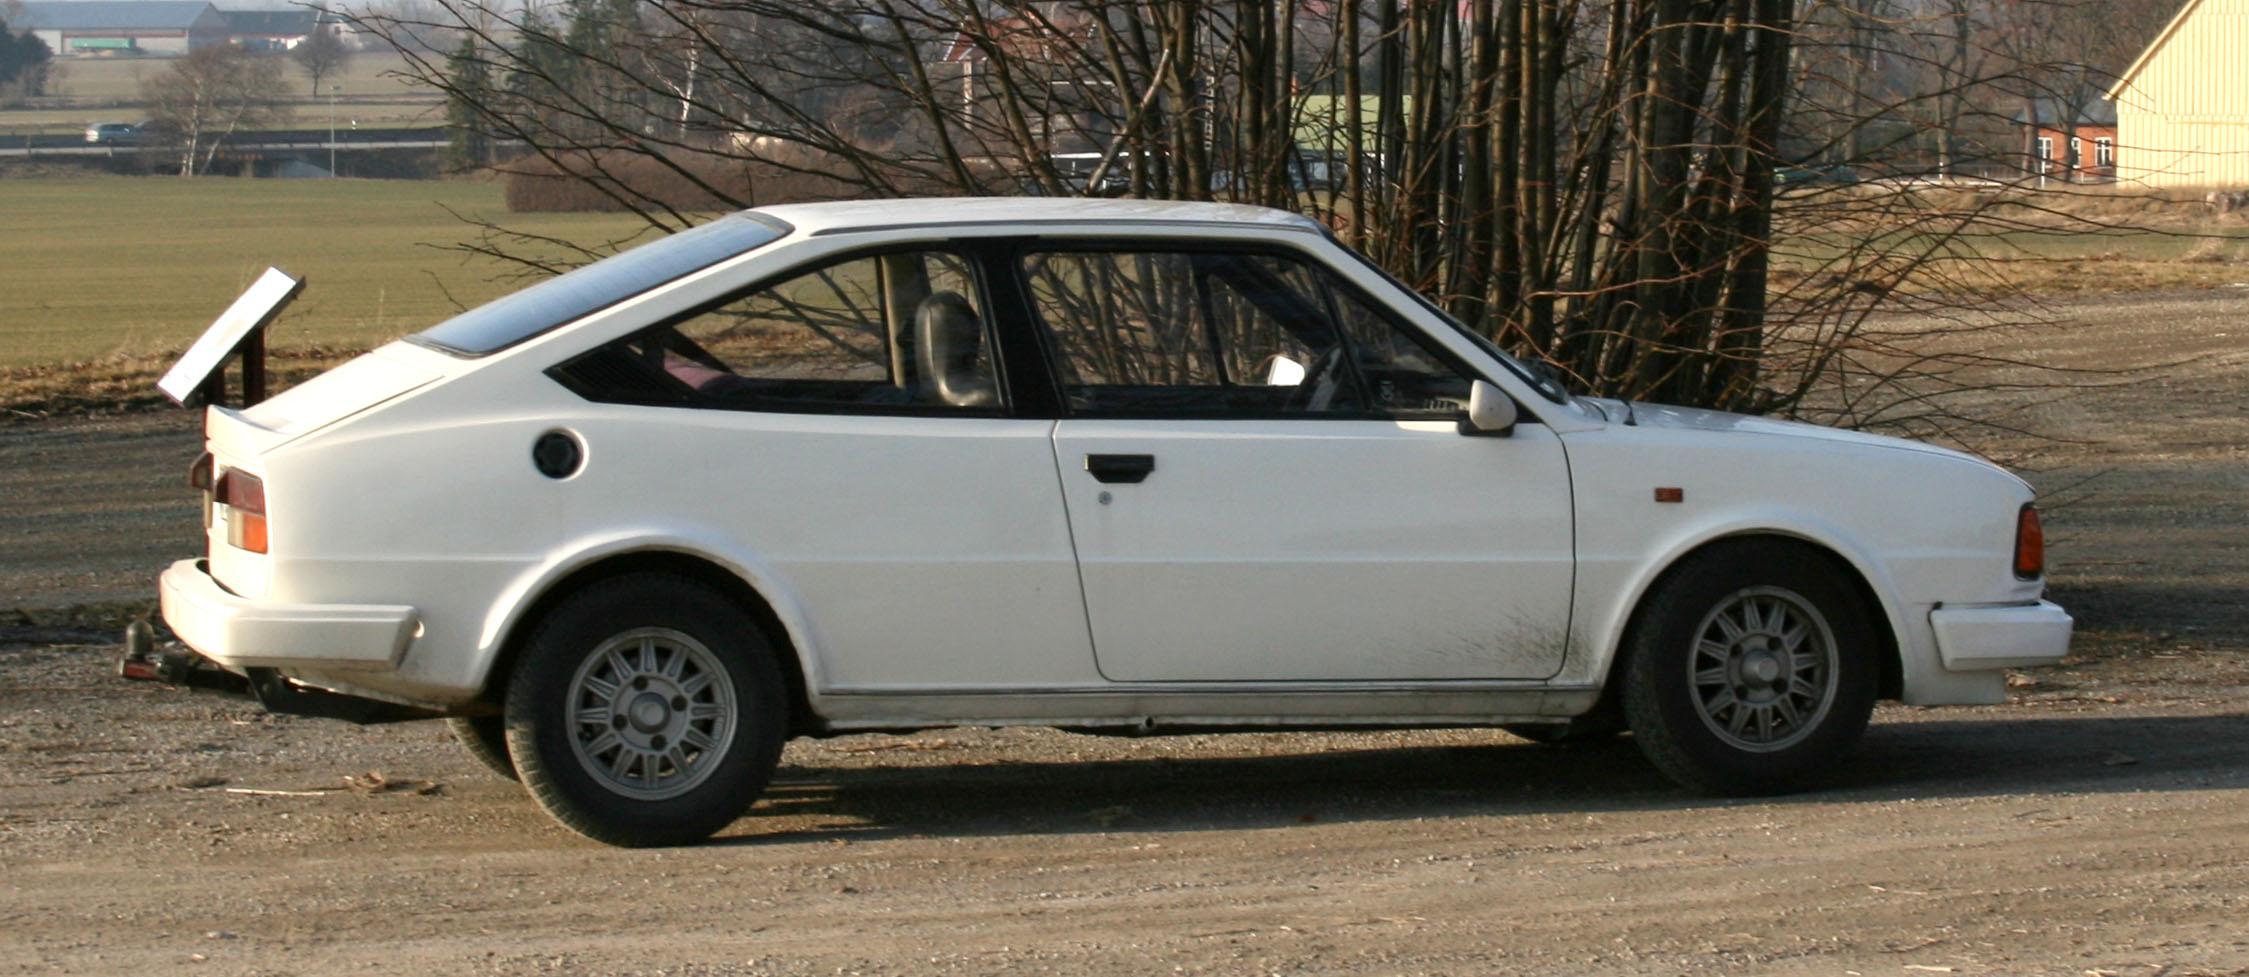 1985 Skoda 125